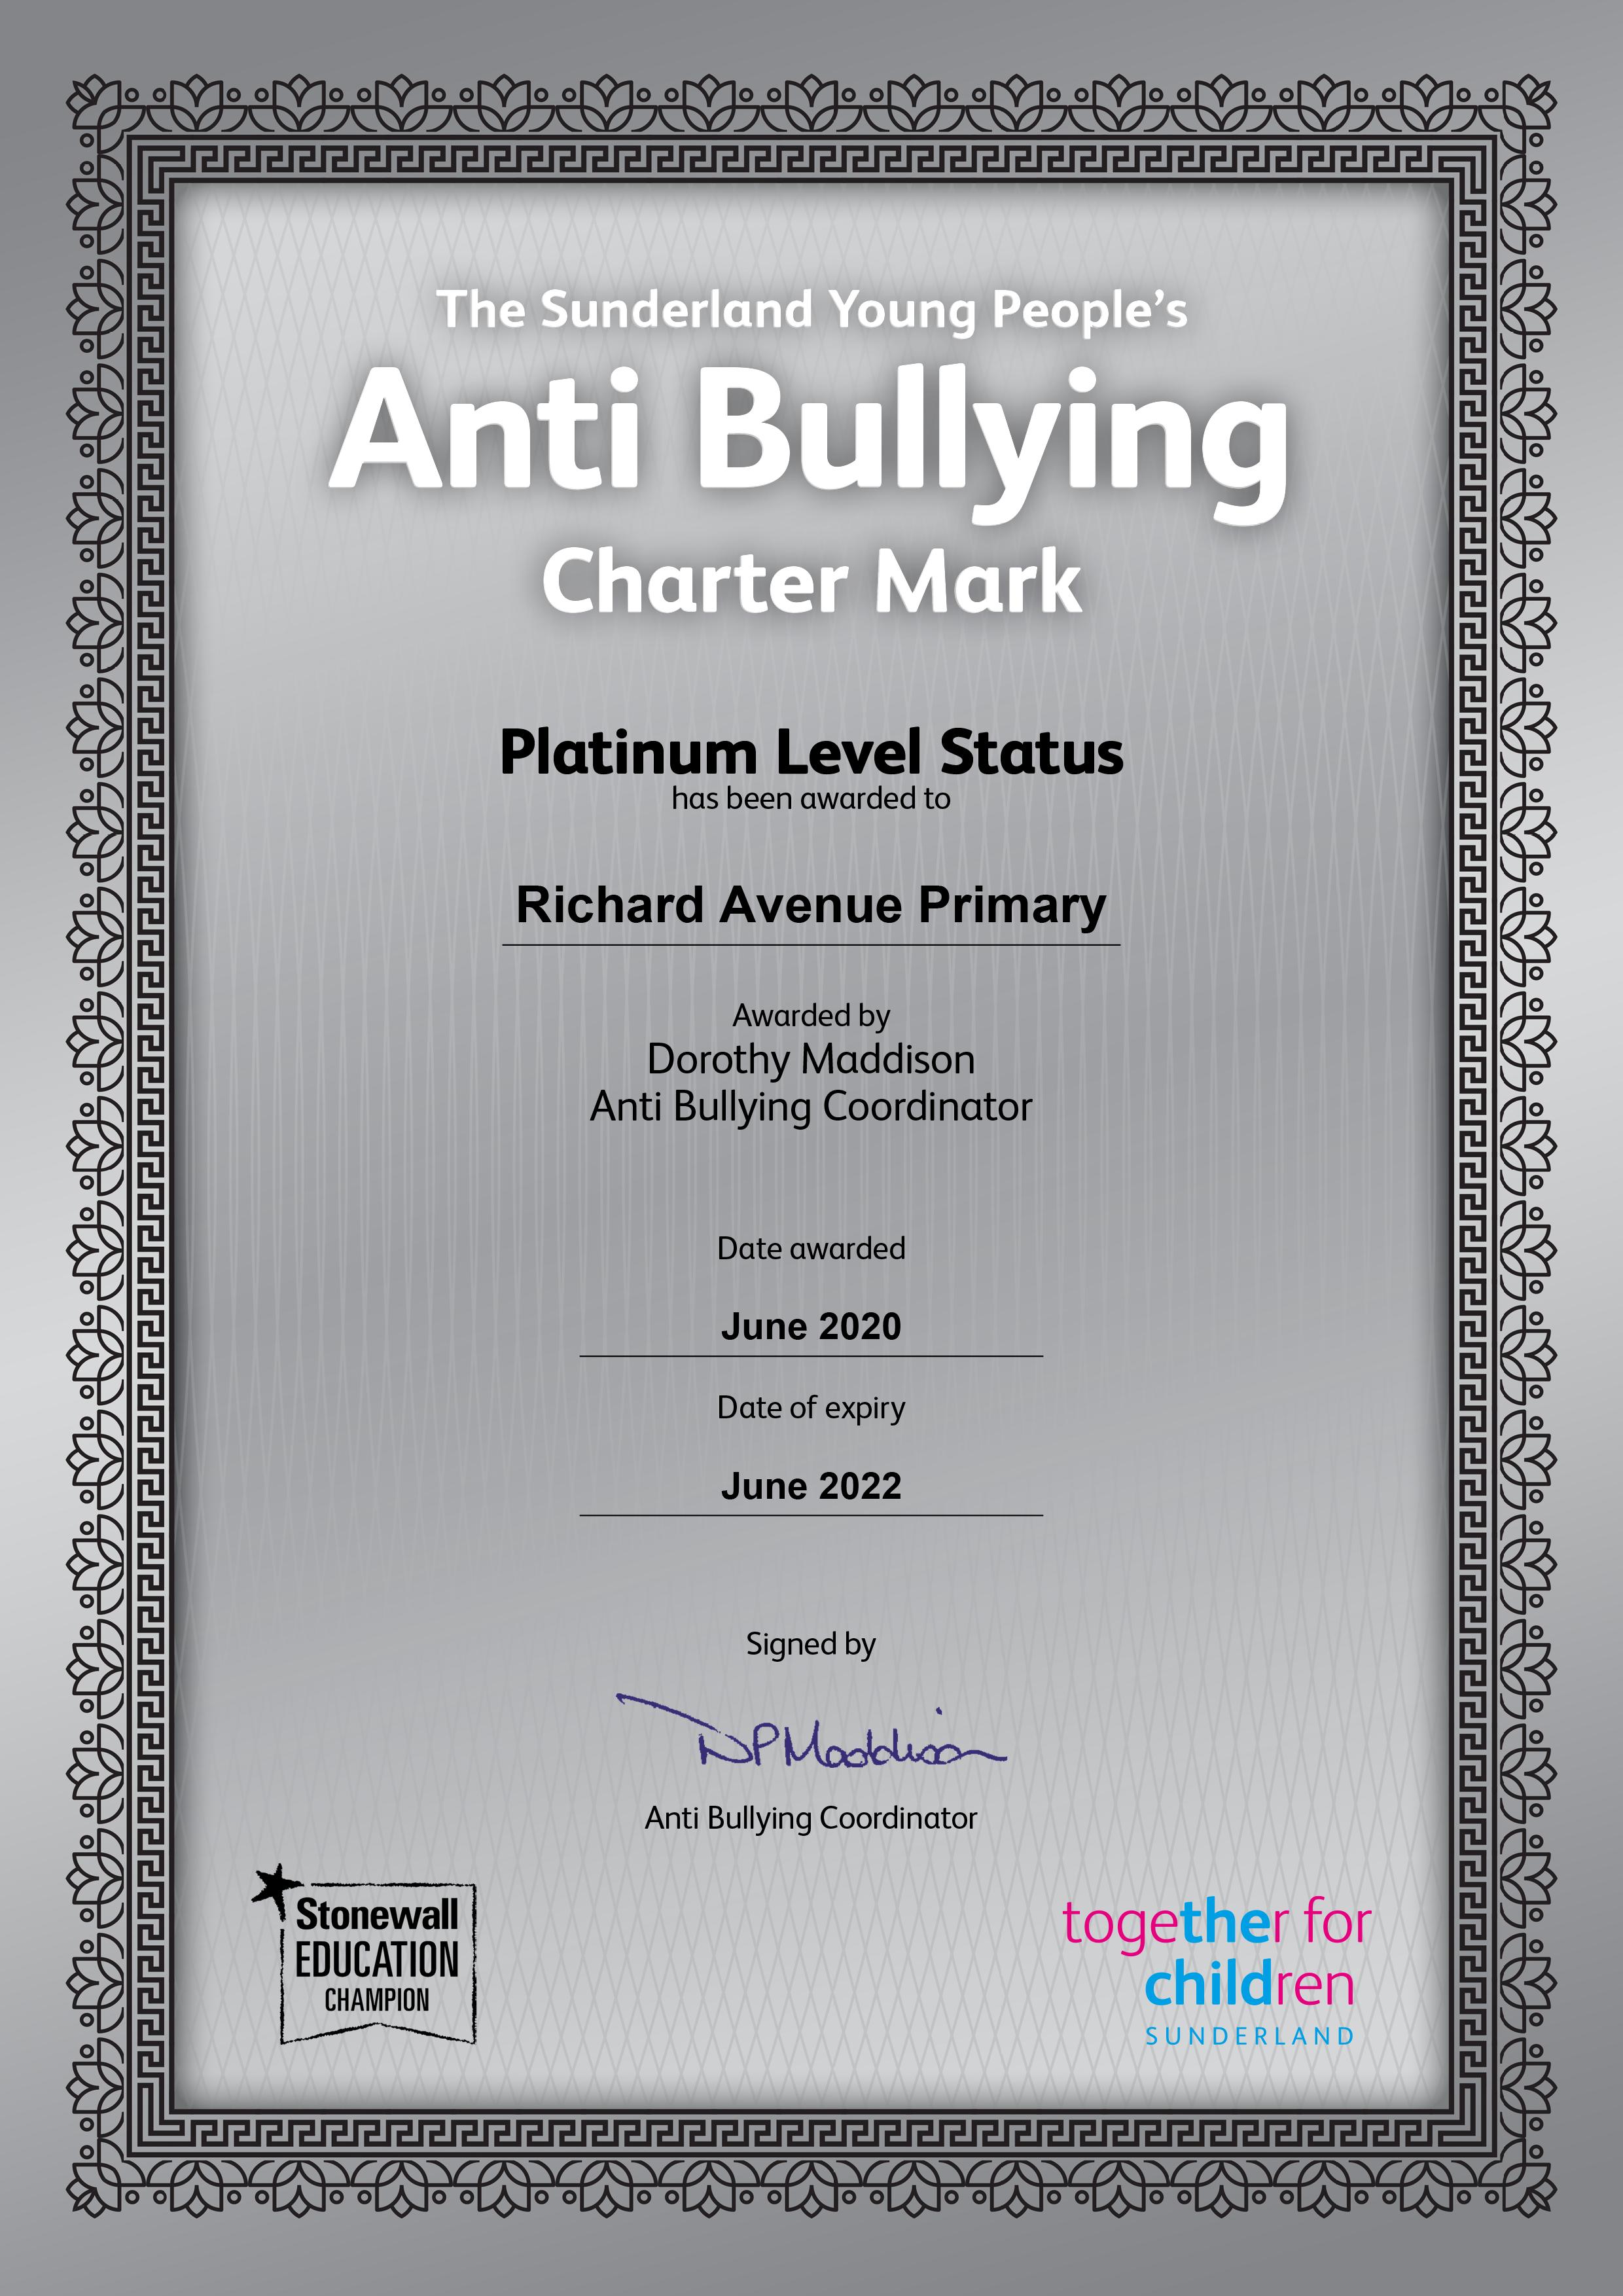 Richard Ave Platinum Anti Bullying Cert